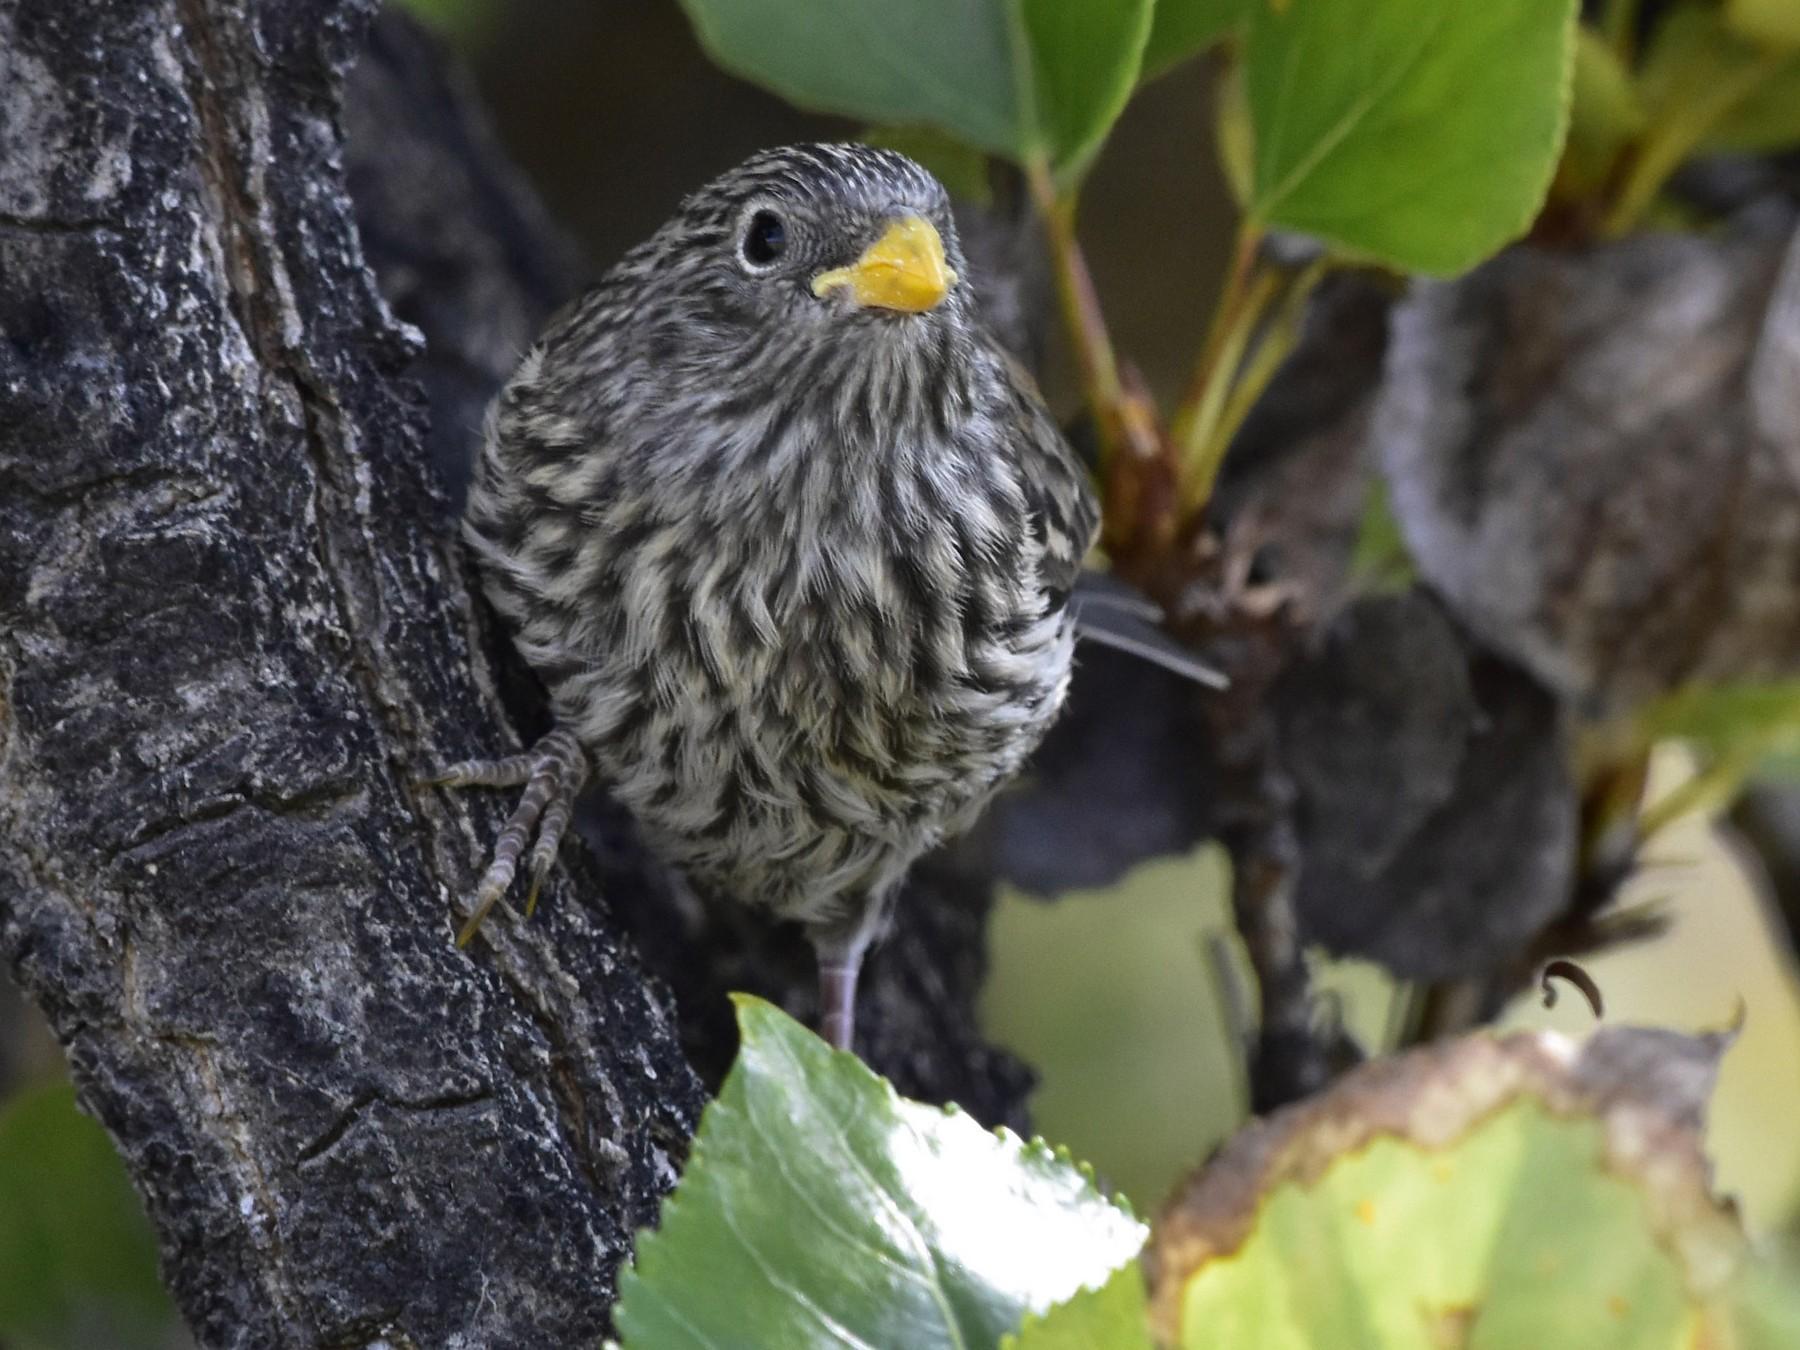 Band-tailed Seedeater - VERONICA ARAYA GARCIA